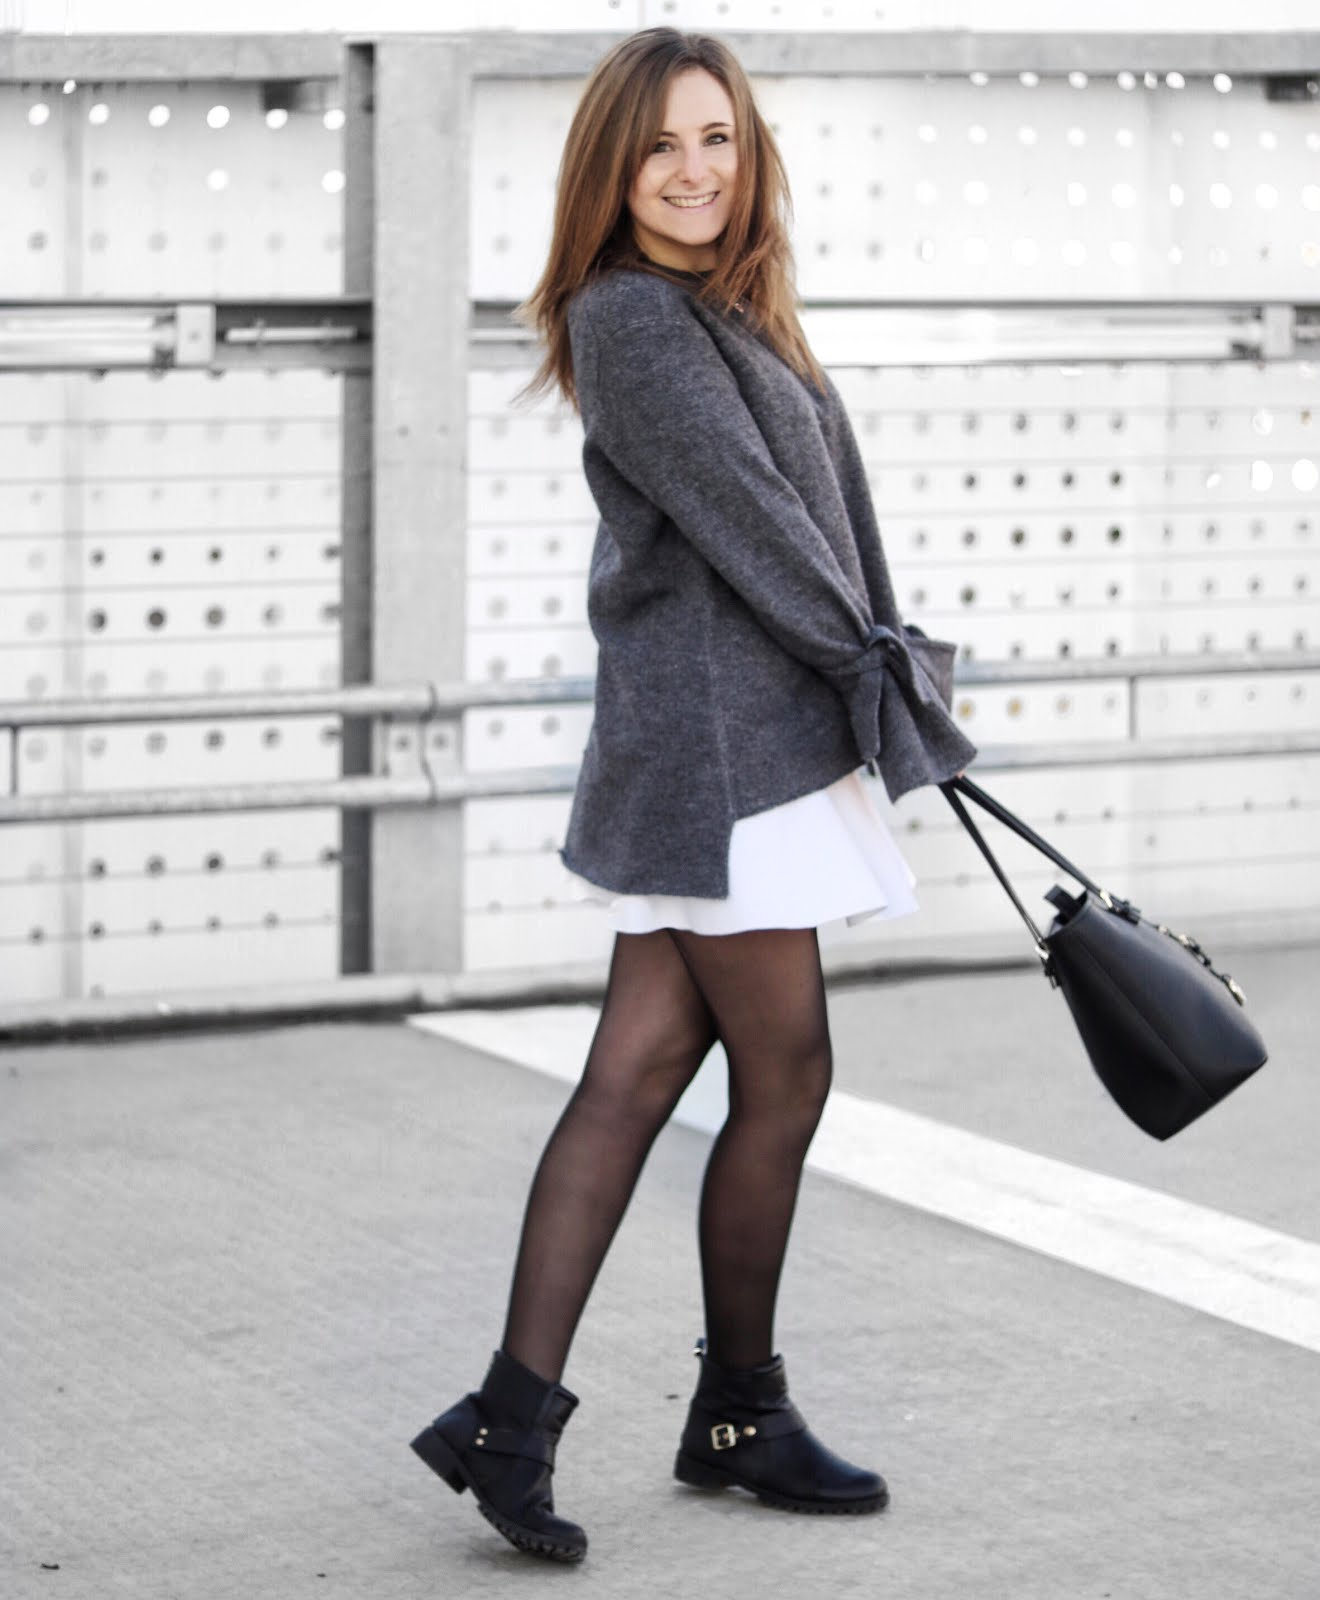 Lifestyle • Fashion • Travel •